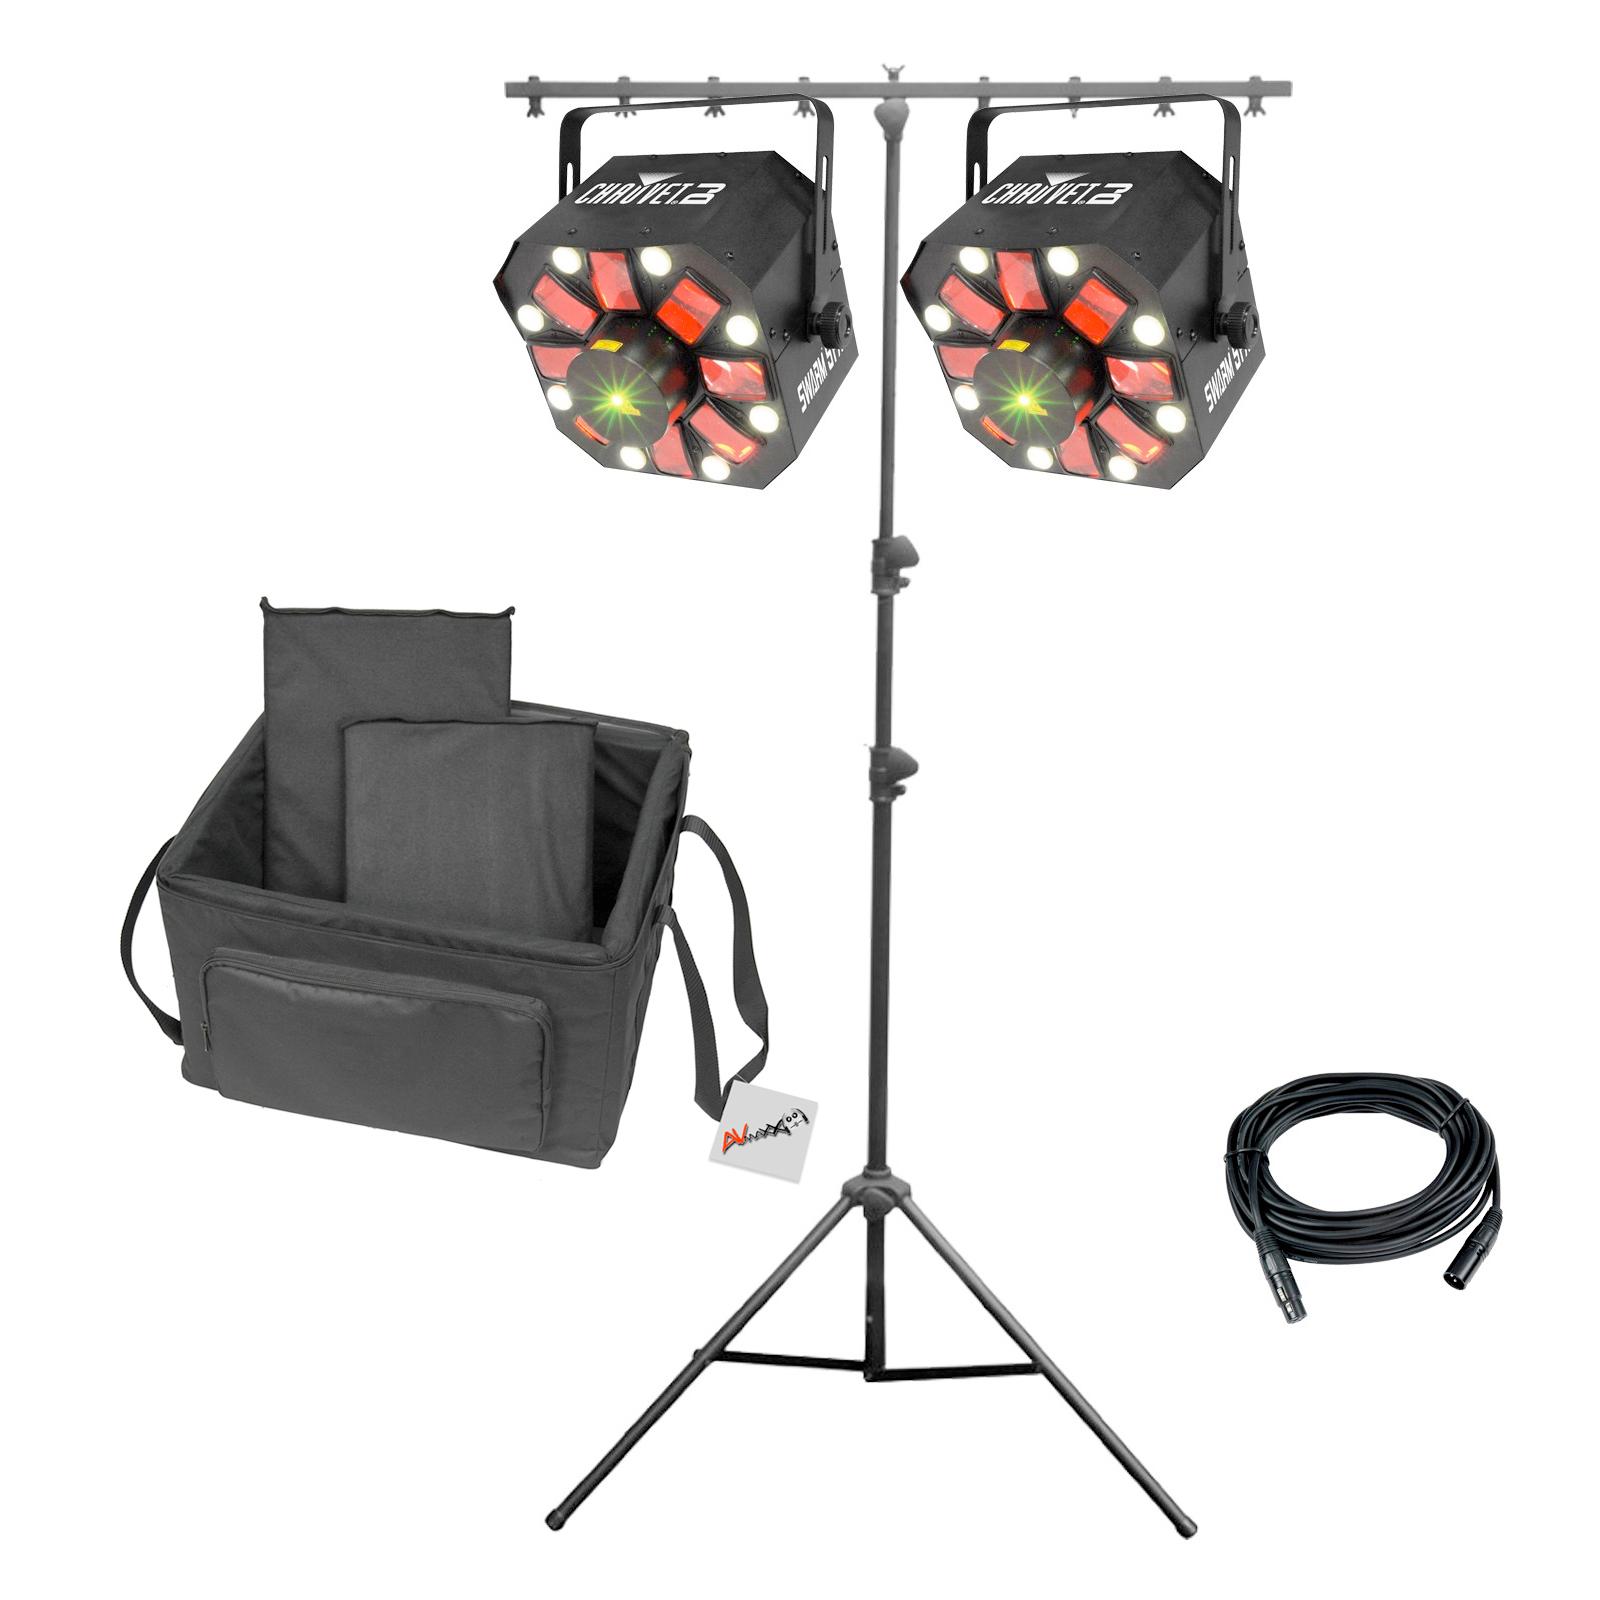 chauvet dj swarm 5 fx 3 in 1 led effect light duo package. Black Bedroom Furniture Sets. Home Design Ideas